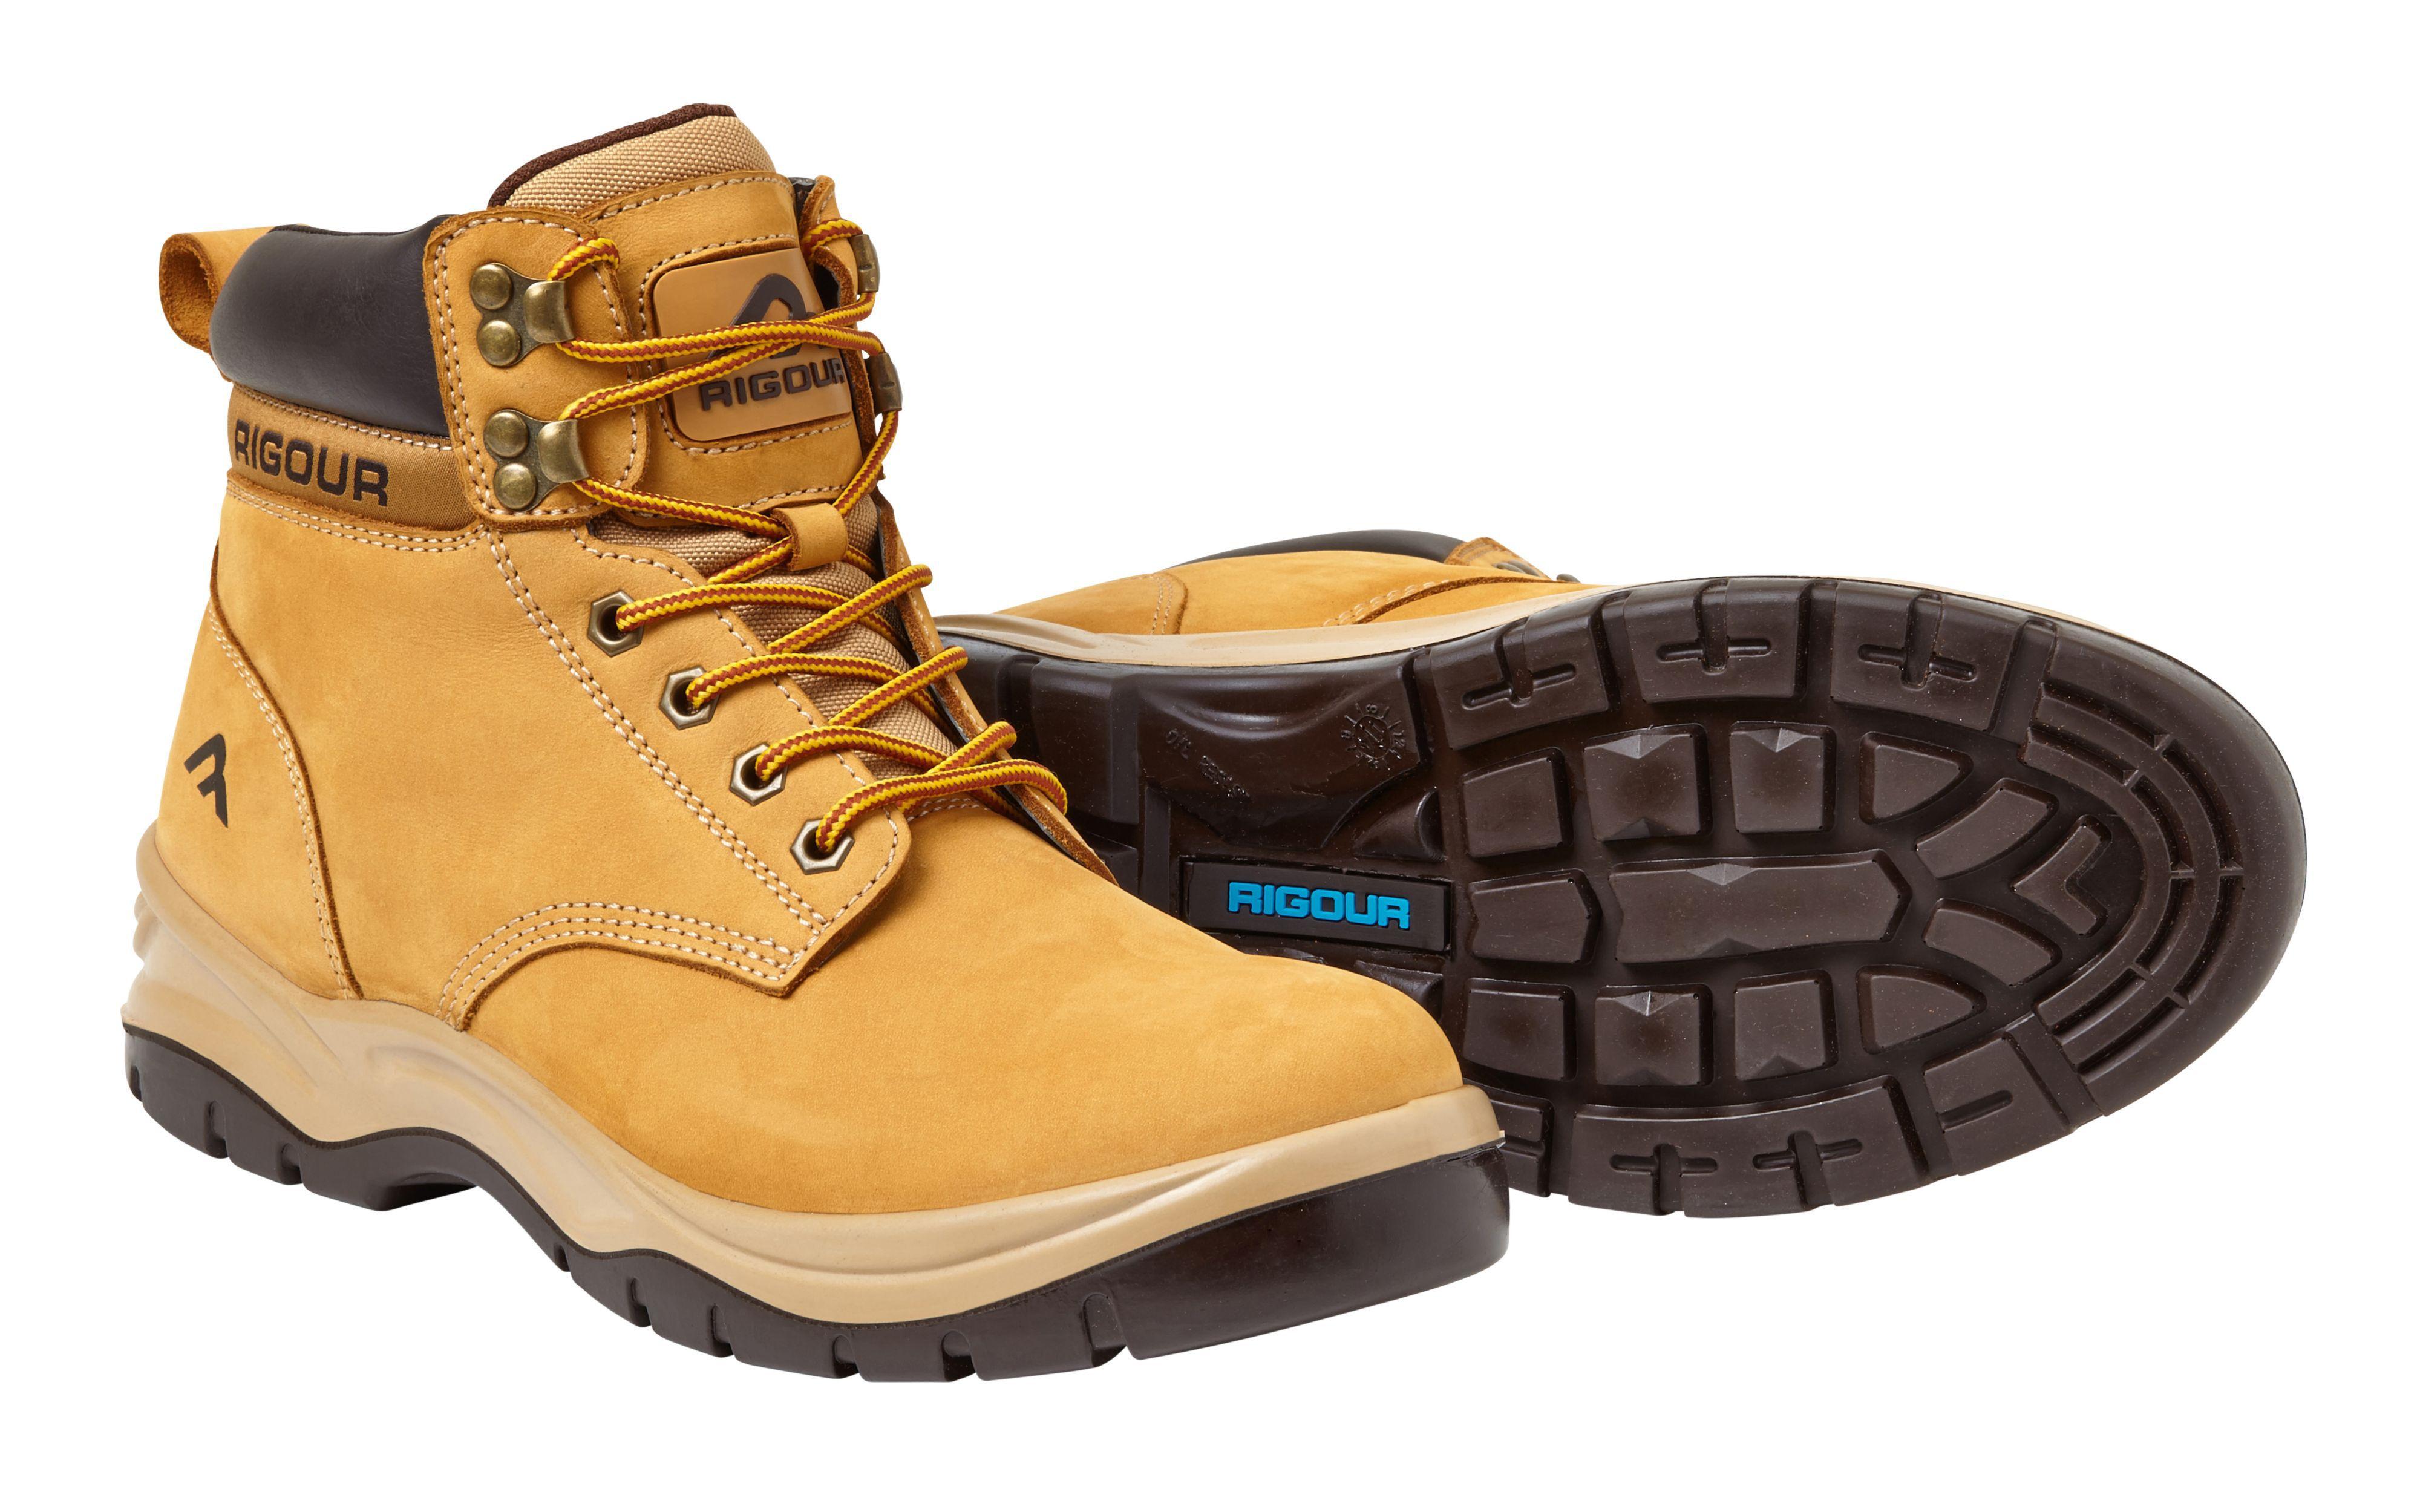 Rigour Wheat Safety Work Boots, Size 9